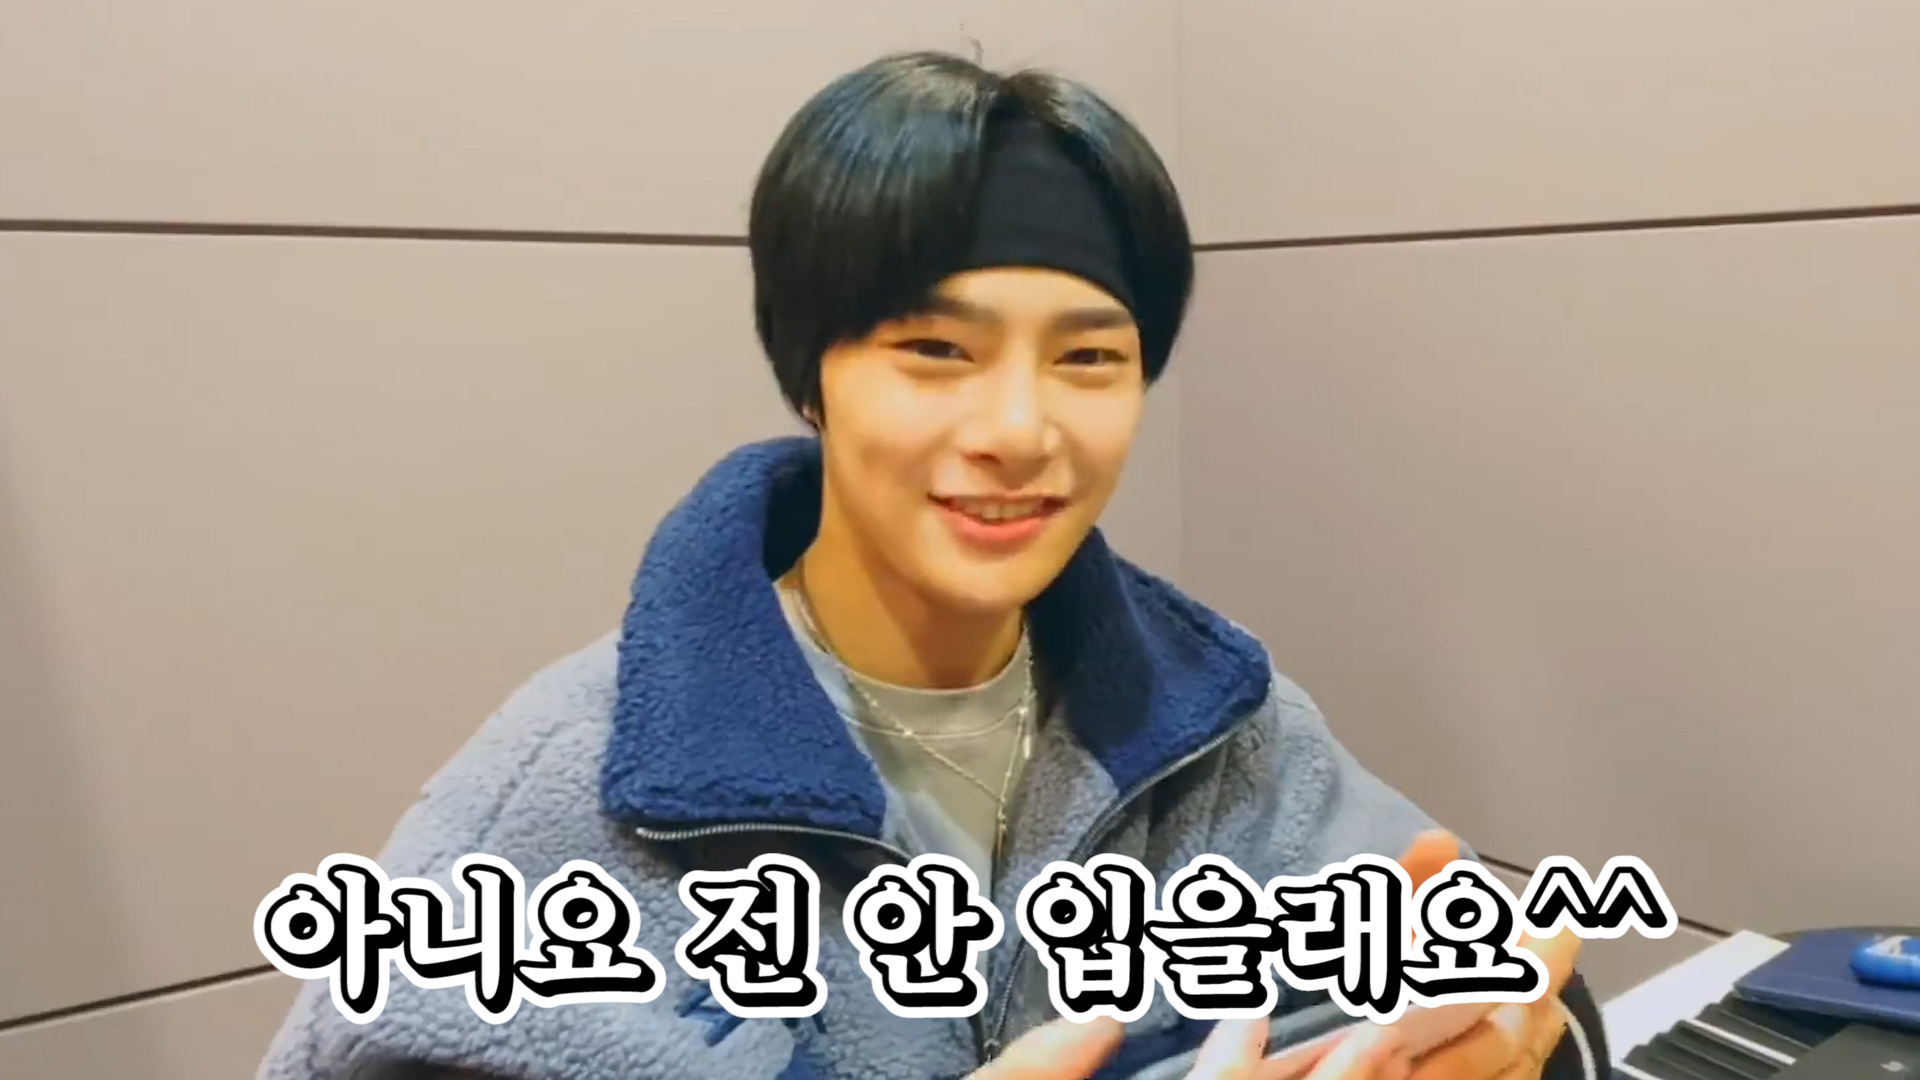 [Stray Kids] 정인이는 들숨날숨만 해도 뽀시락MAX니까..☆(feat.비닐바지) (I.N talking about JYP's vinylpants)